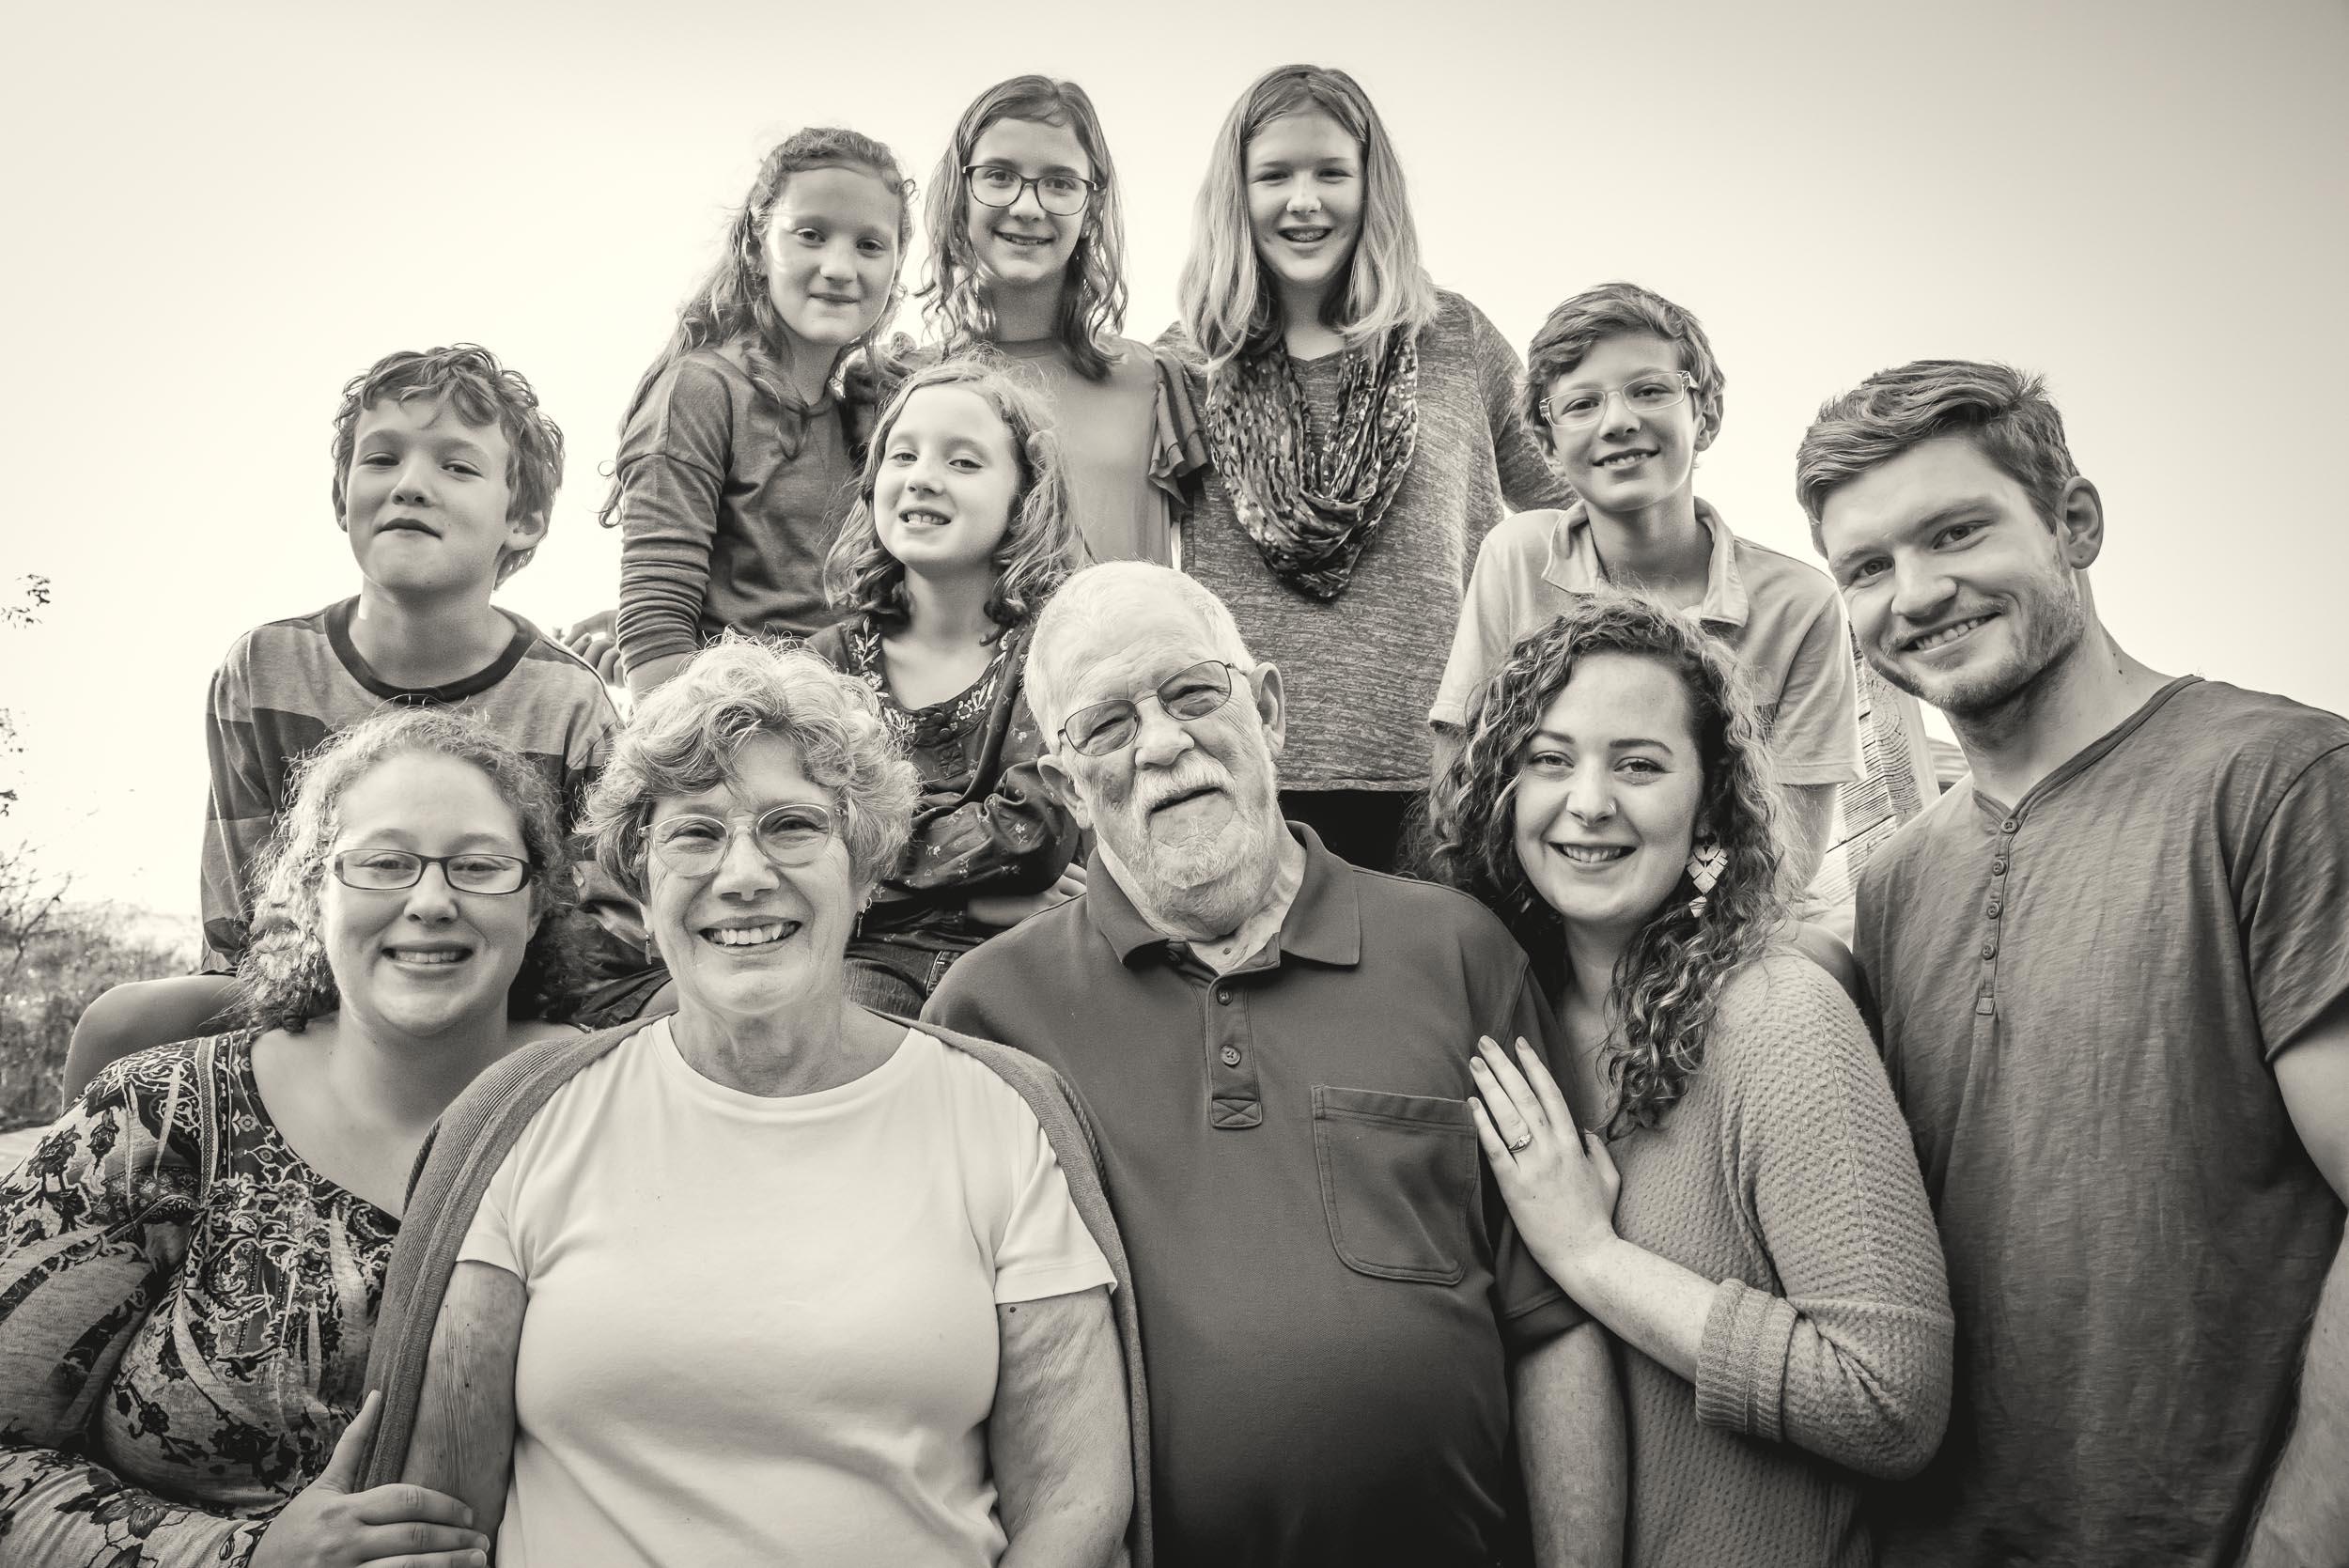 Family_Senior_Wedding_Maryland_Photographer_Sonny_and_Allison_Favorites_Easton_Crofton_Oxford-78.jpg